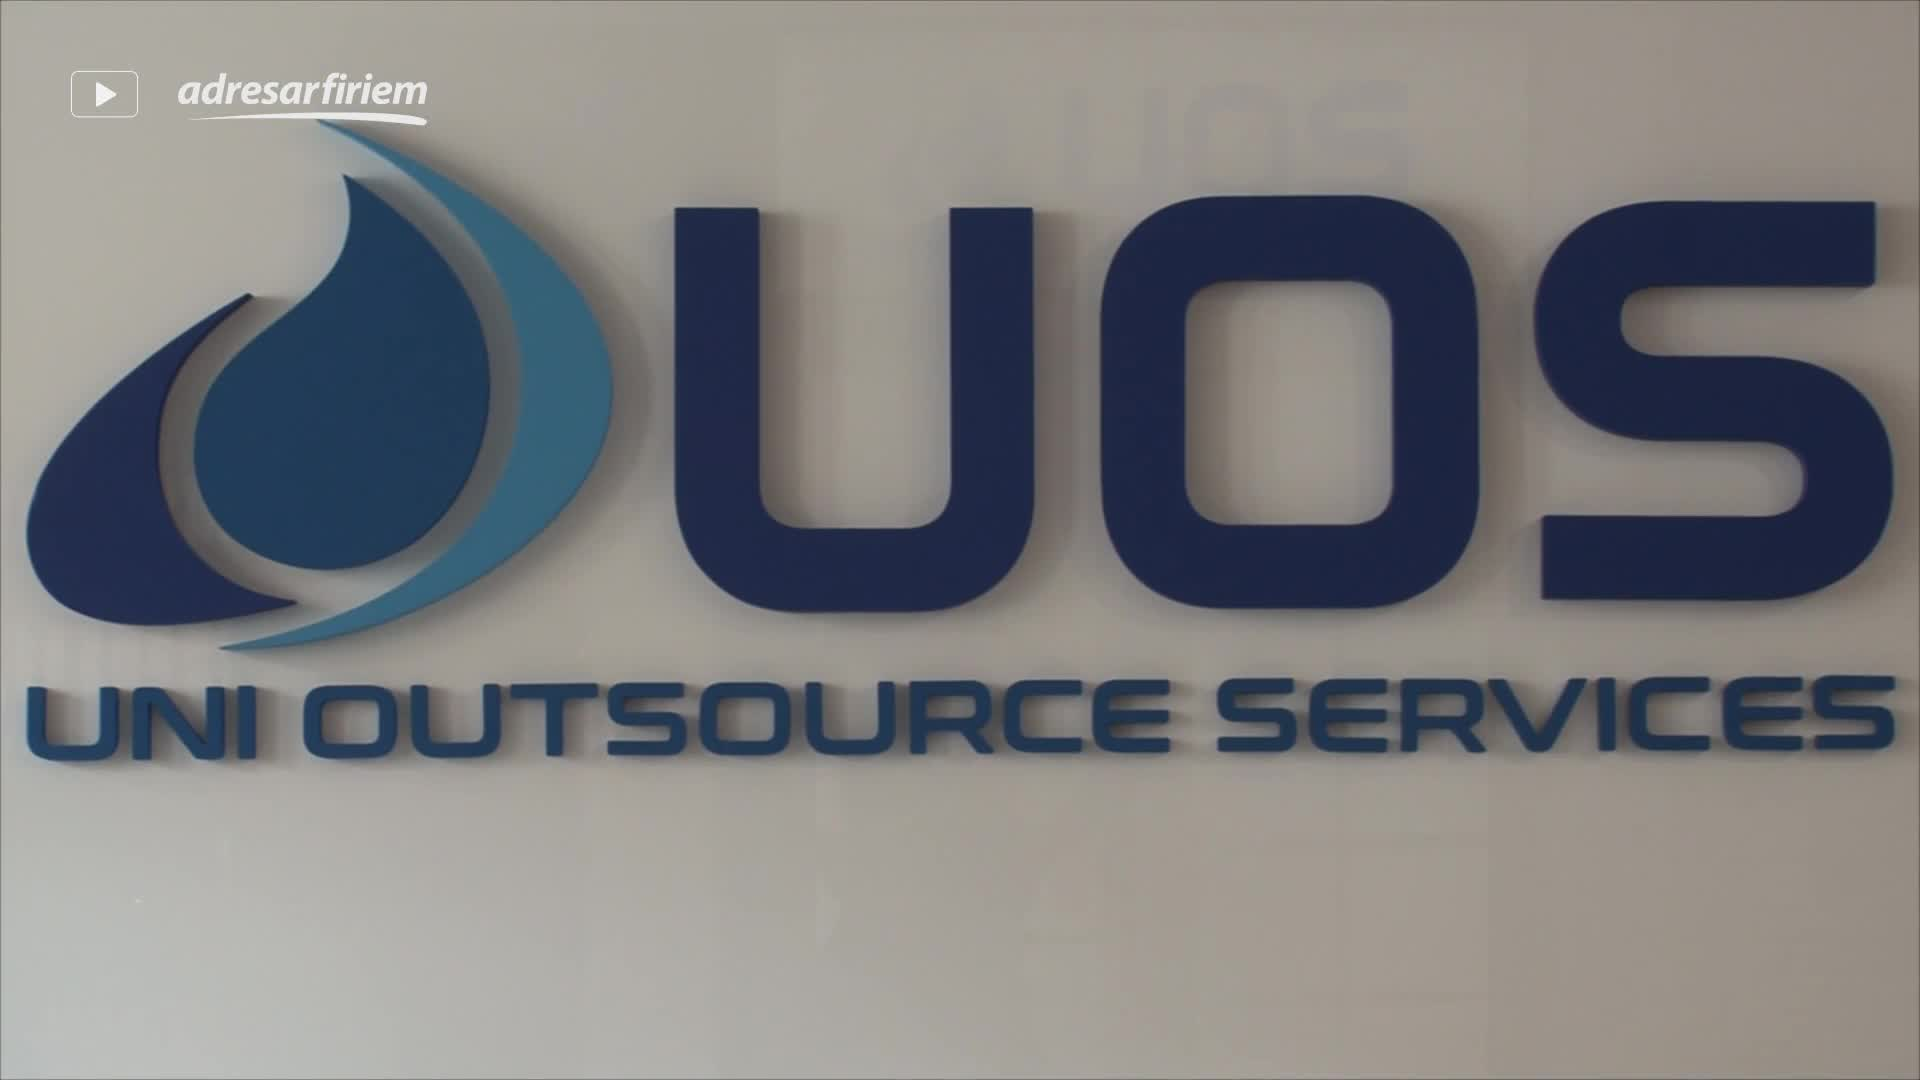 Video UOS - Uni Outsource Services s.r.o. Zvolen